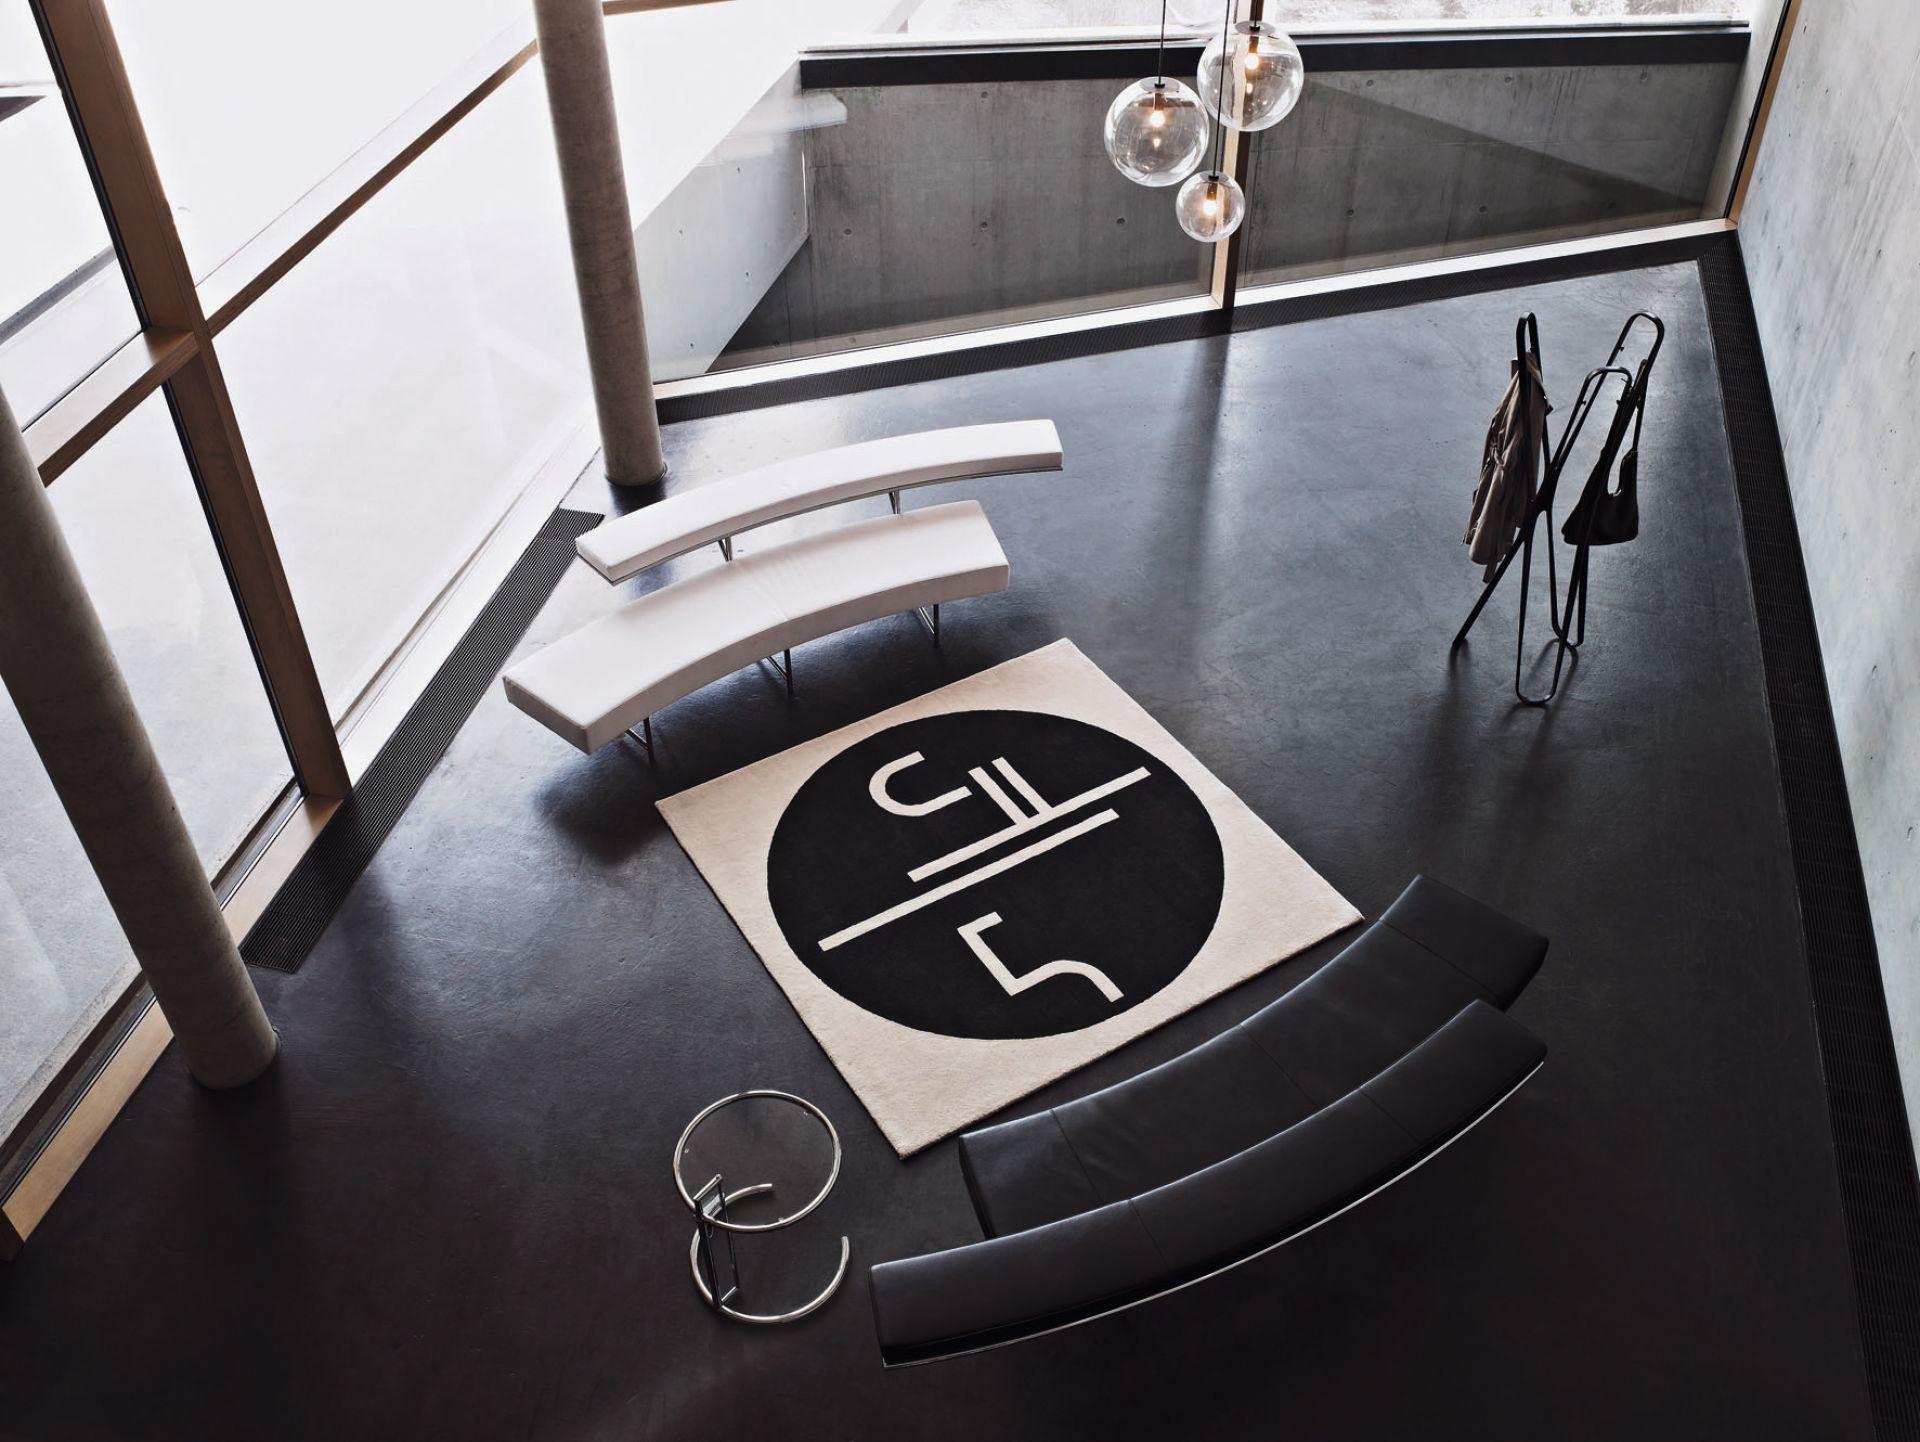 Adjustable Table E 1027 Beistelltisch ClassiCon